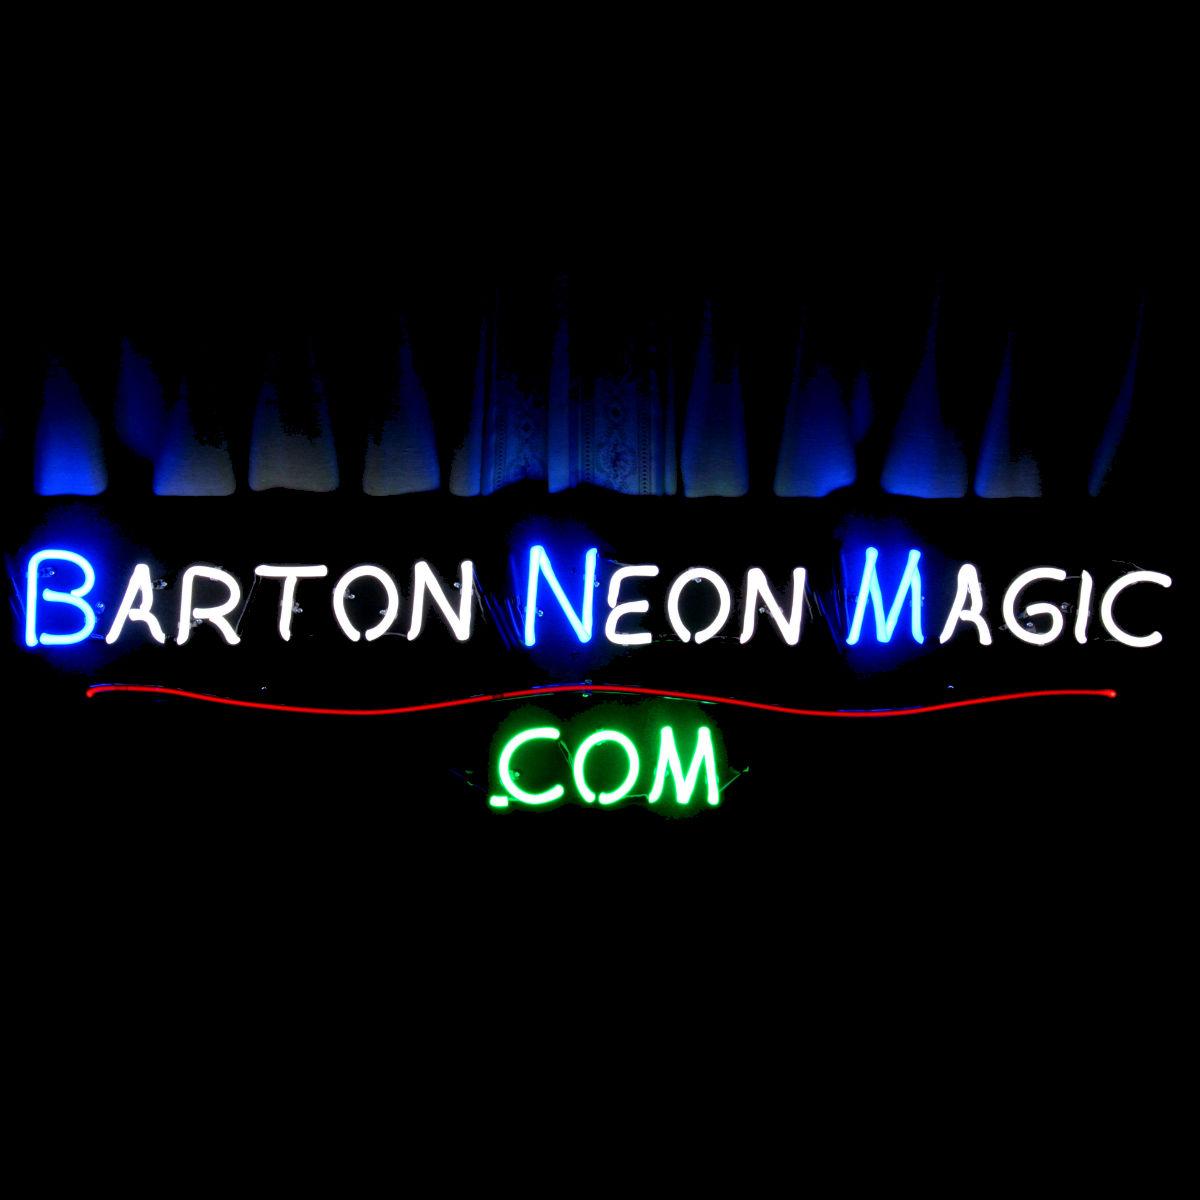 Custom Designer Neon Light Fixtures by John Barton - BartonNeonMagic.com